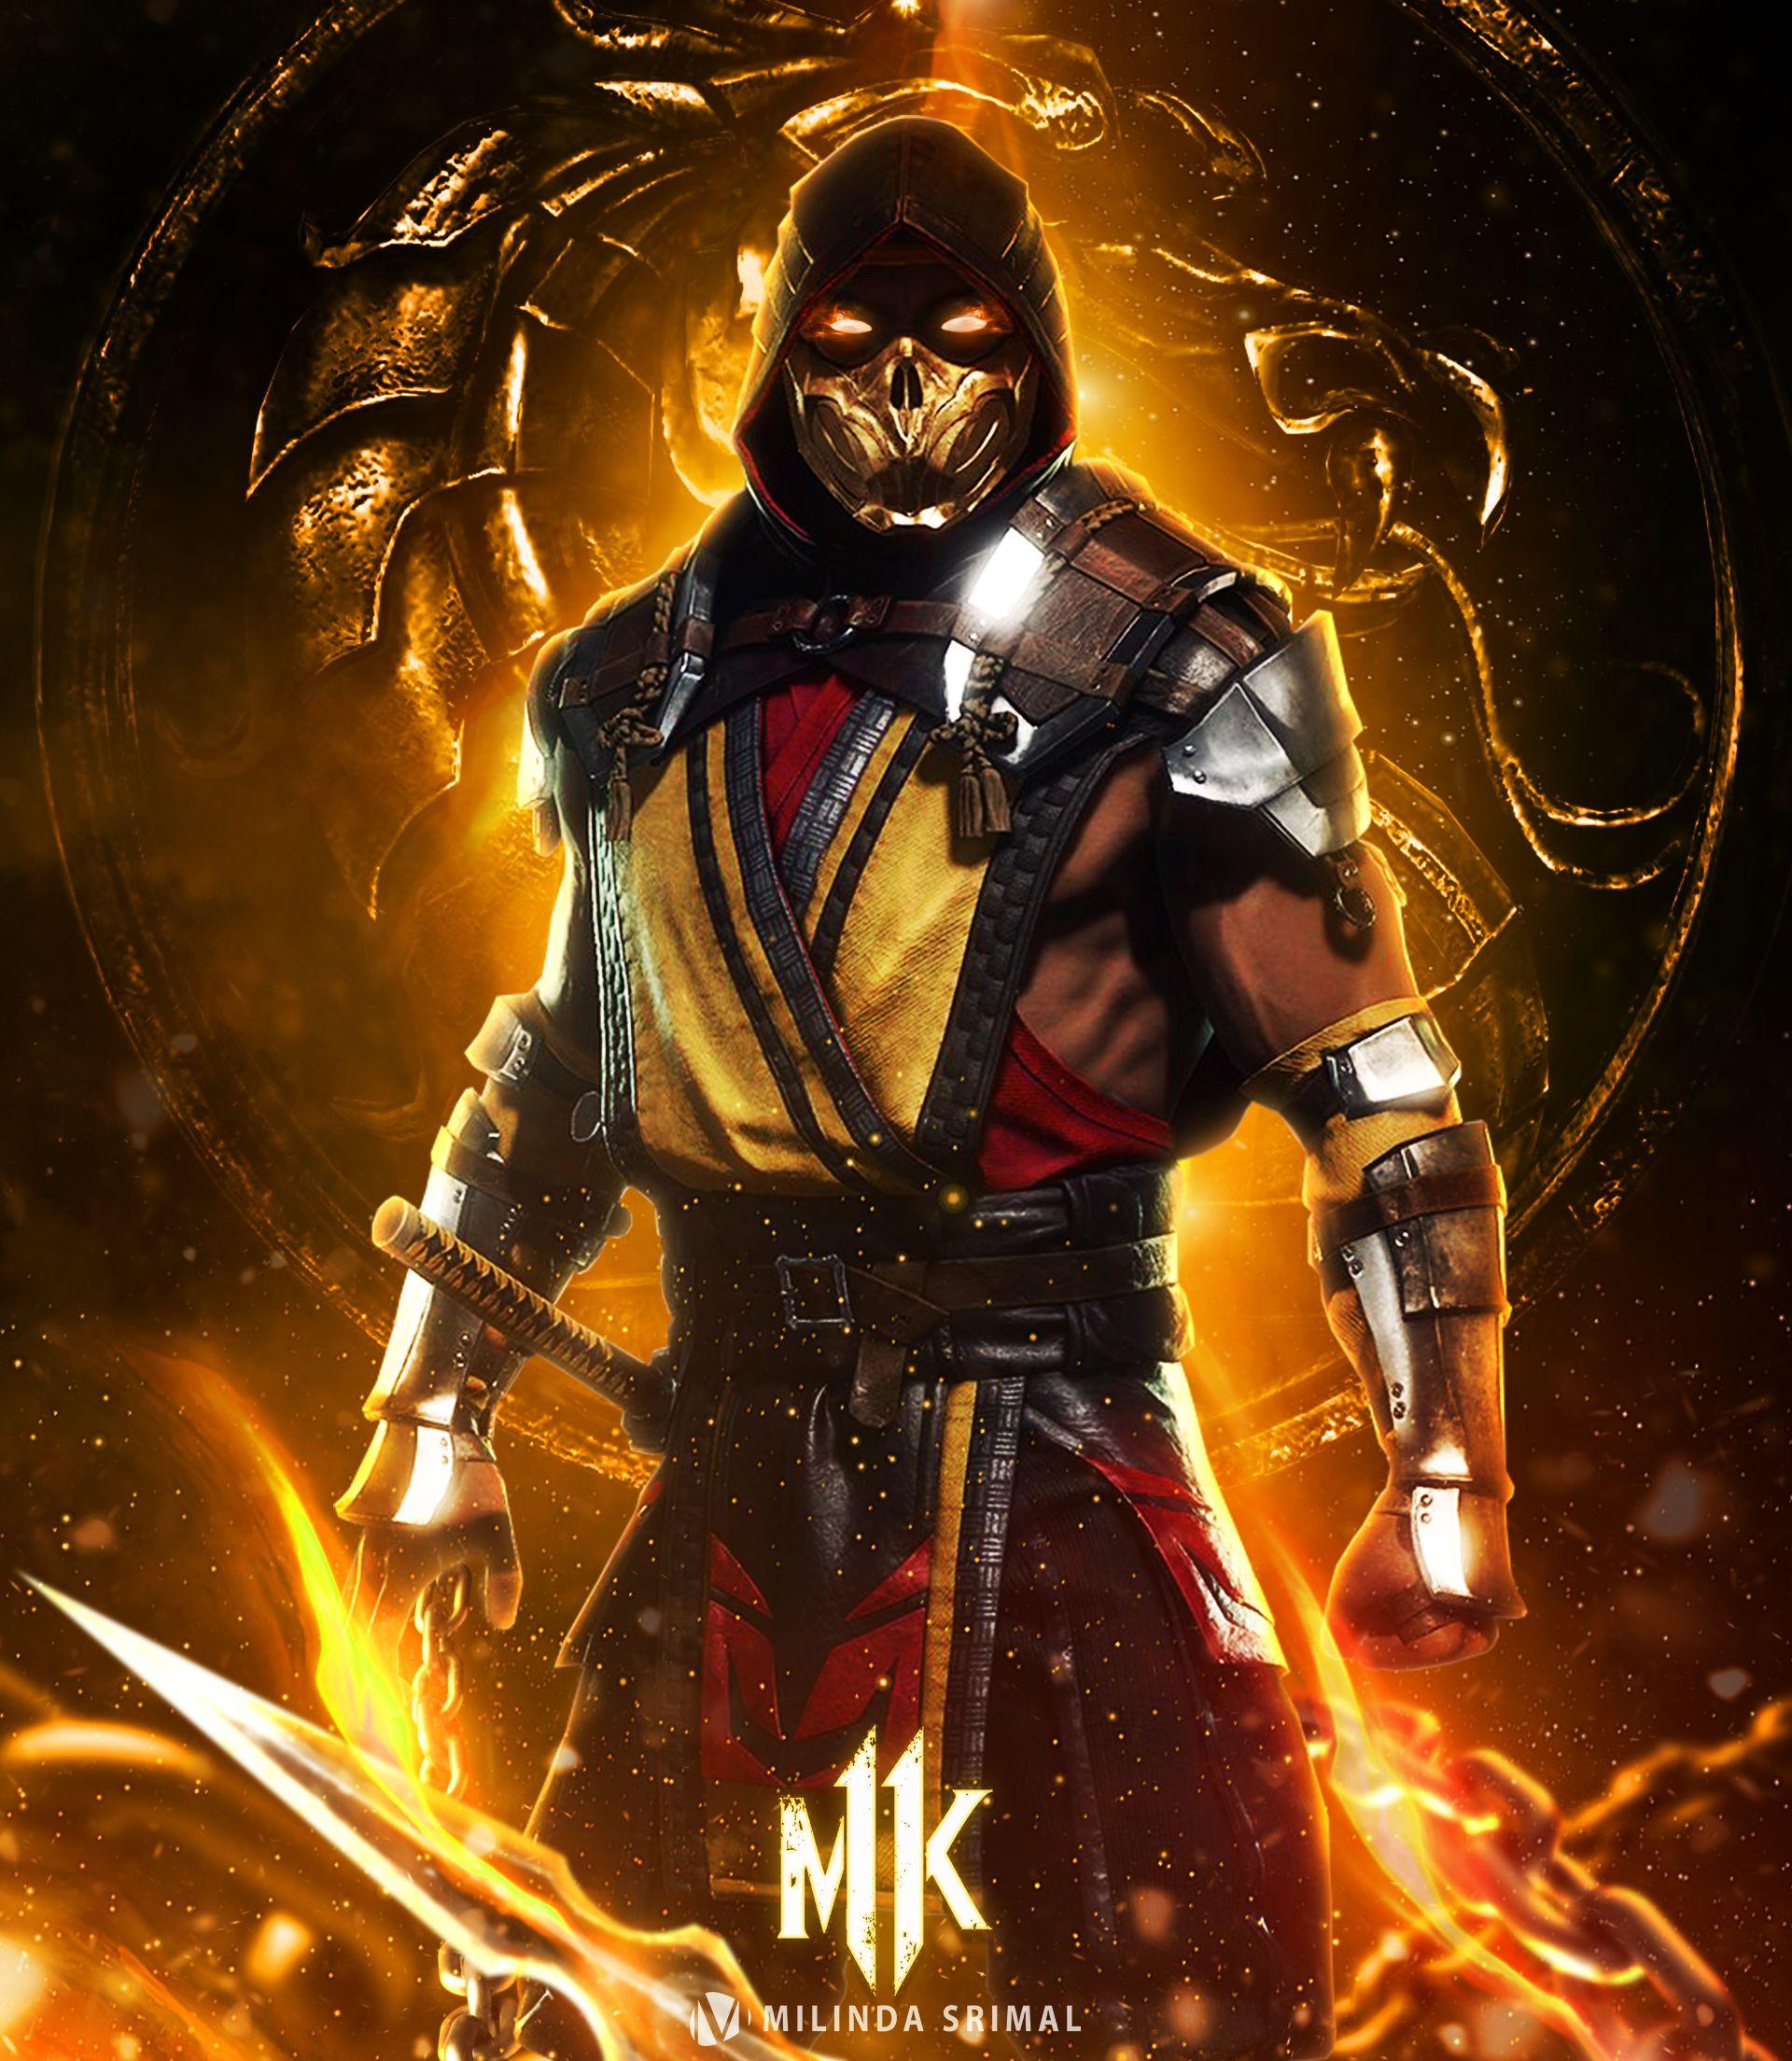 Mortal Kombat 2021 Poster Scorpion Poster Scorpion Mortal Kombat Mortal Kombat Art Mortal Kombat X Wallpapers